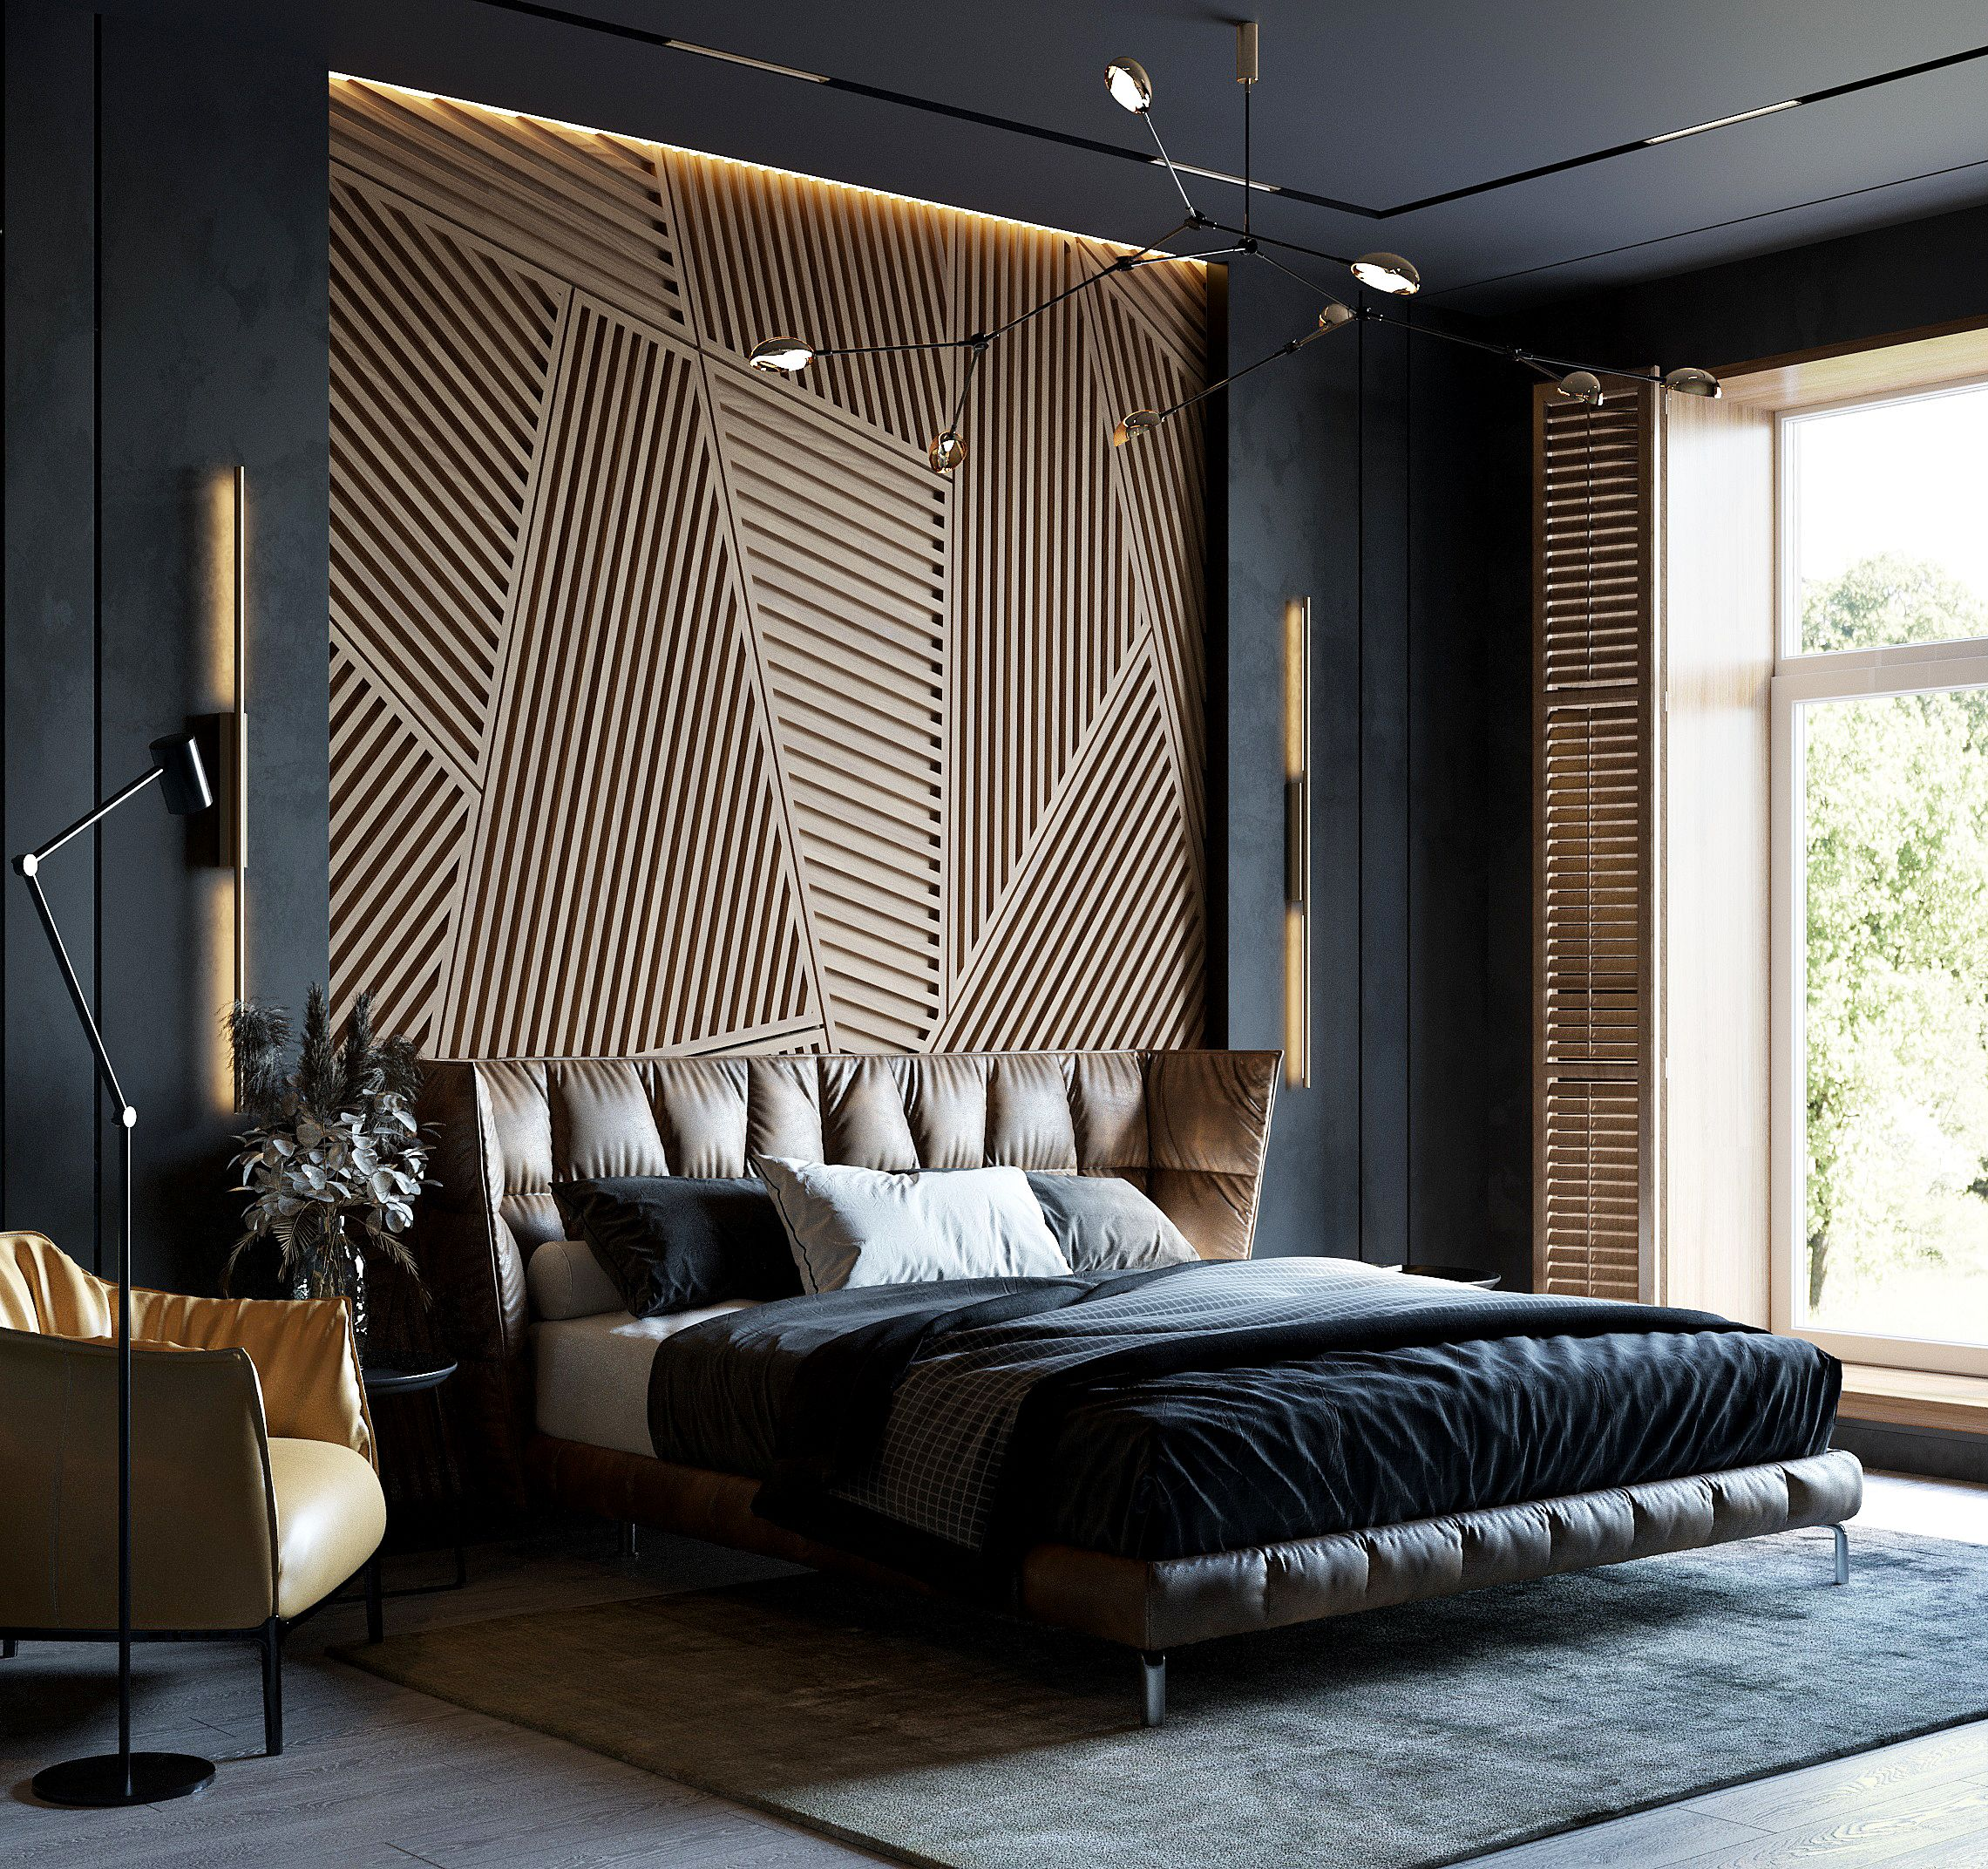 Spalnya V Temnyh Tonah Luxury Room Bedroom Luxury Bedroom Master Modern Bedroom Design Modern luxury room photo